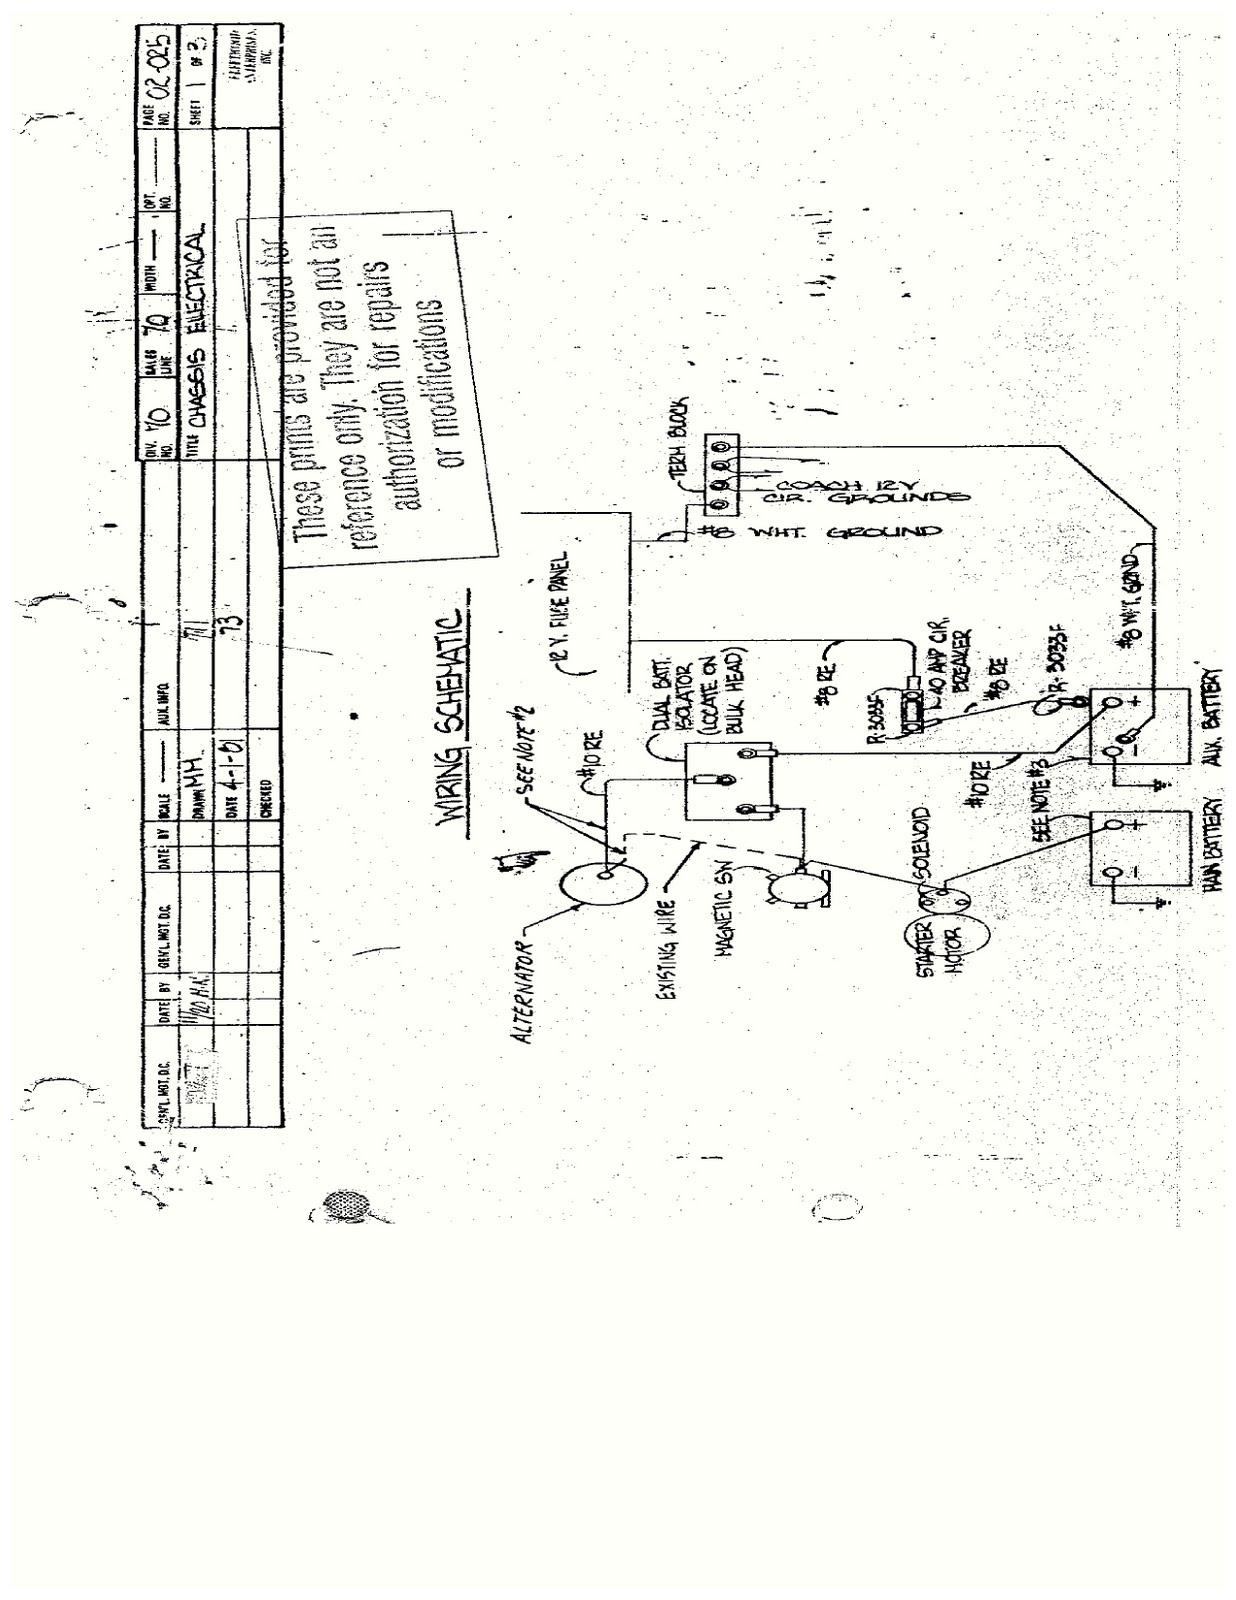 pace arrow wiring diagrams wiring diagram article review83 pace arrow wiring diagram wiring diagram imgwiring diagram for 1985 pace arrow motorhome furthermore 1983